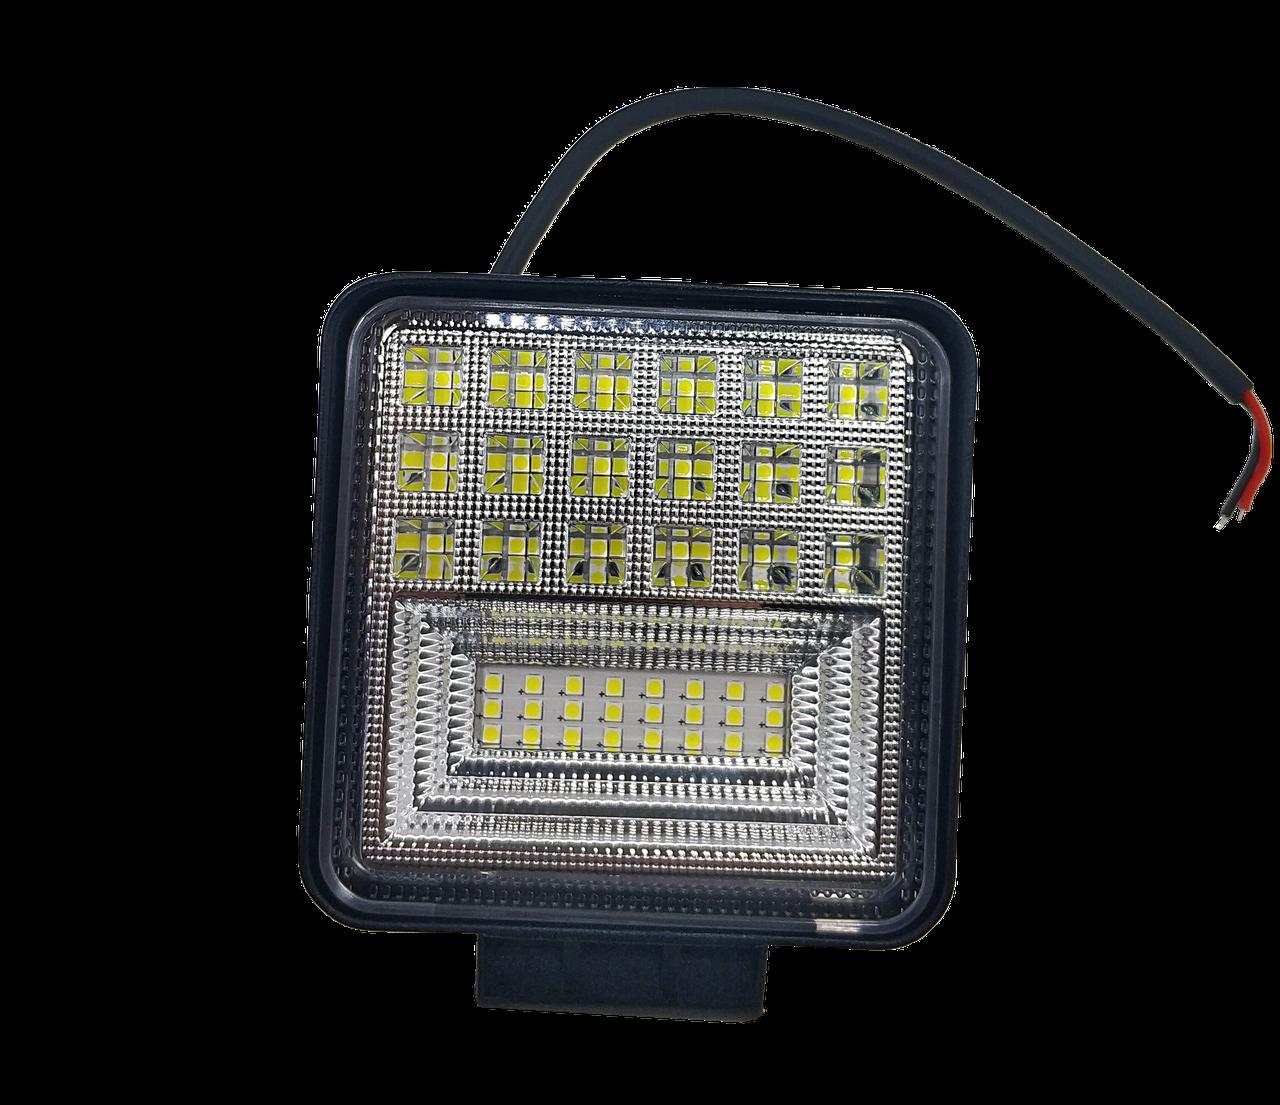 Фара LED квадратная 126 W, 42 лампы, широкий луч 10/30V 6000K толщина: 40 мм